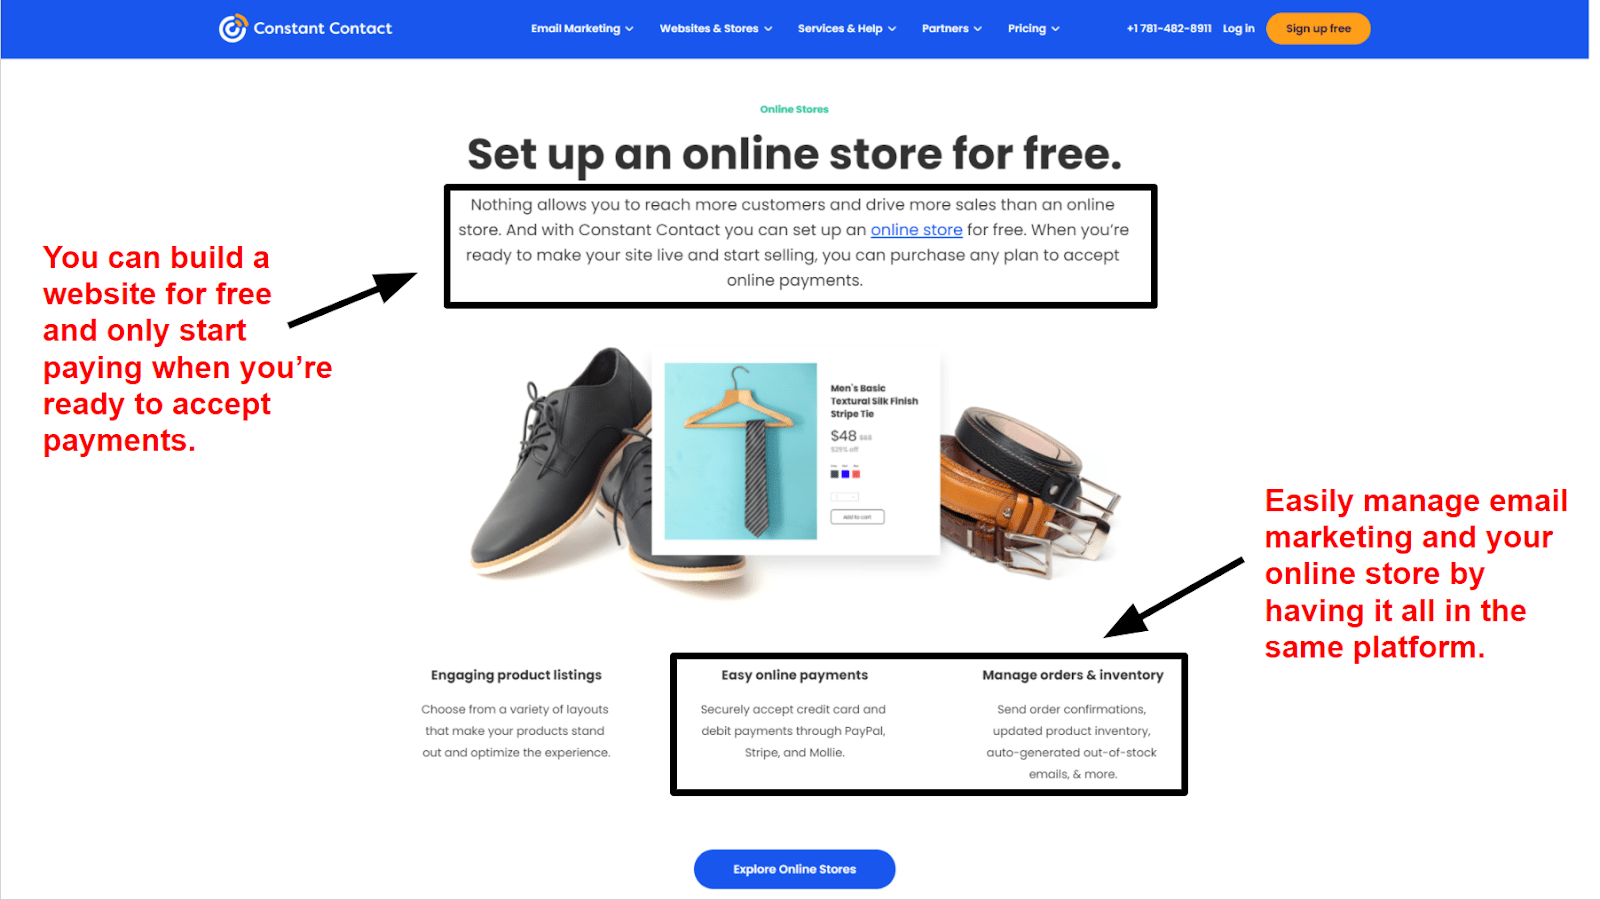 Constant Contact - Online store